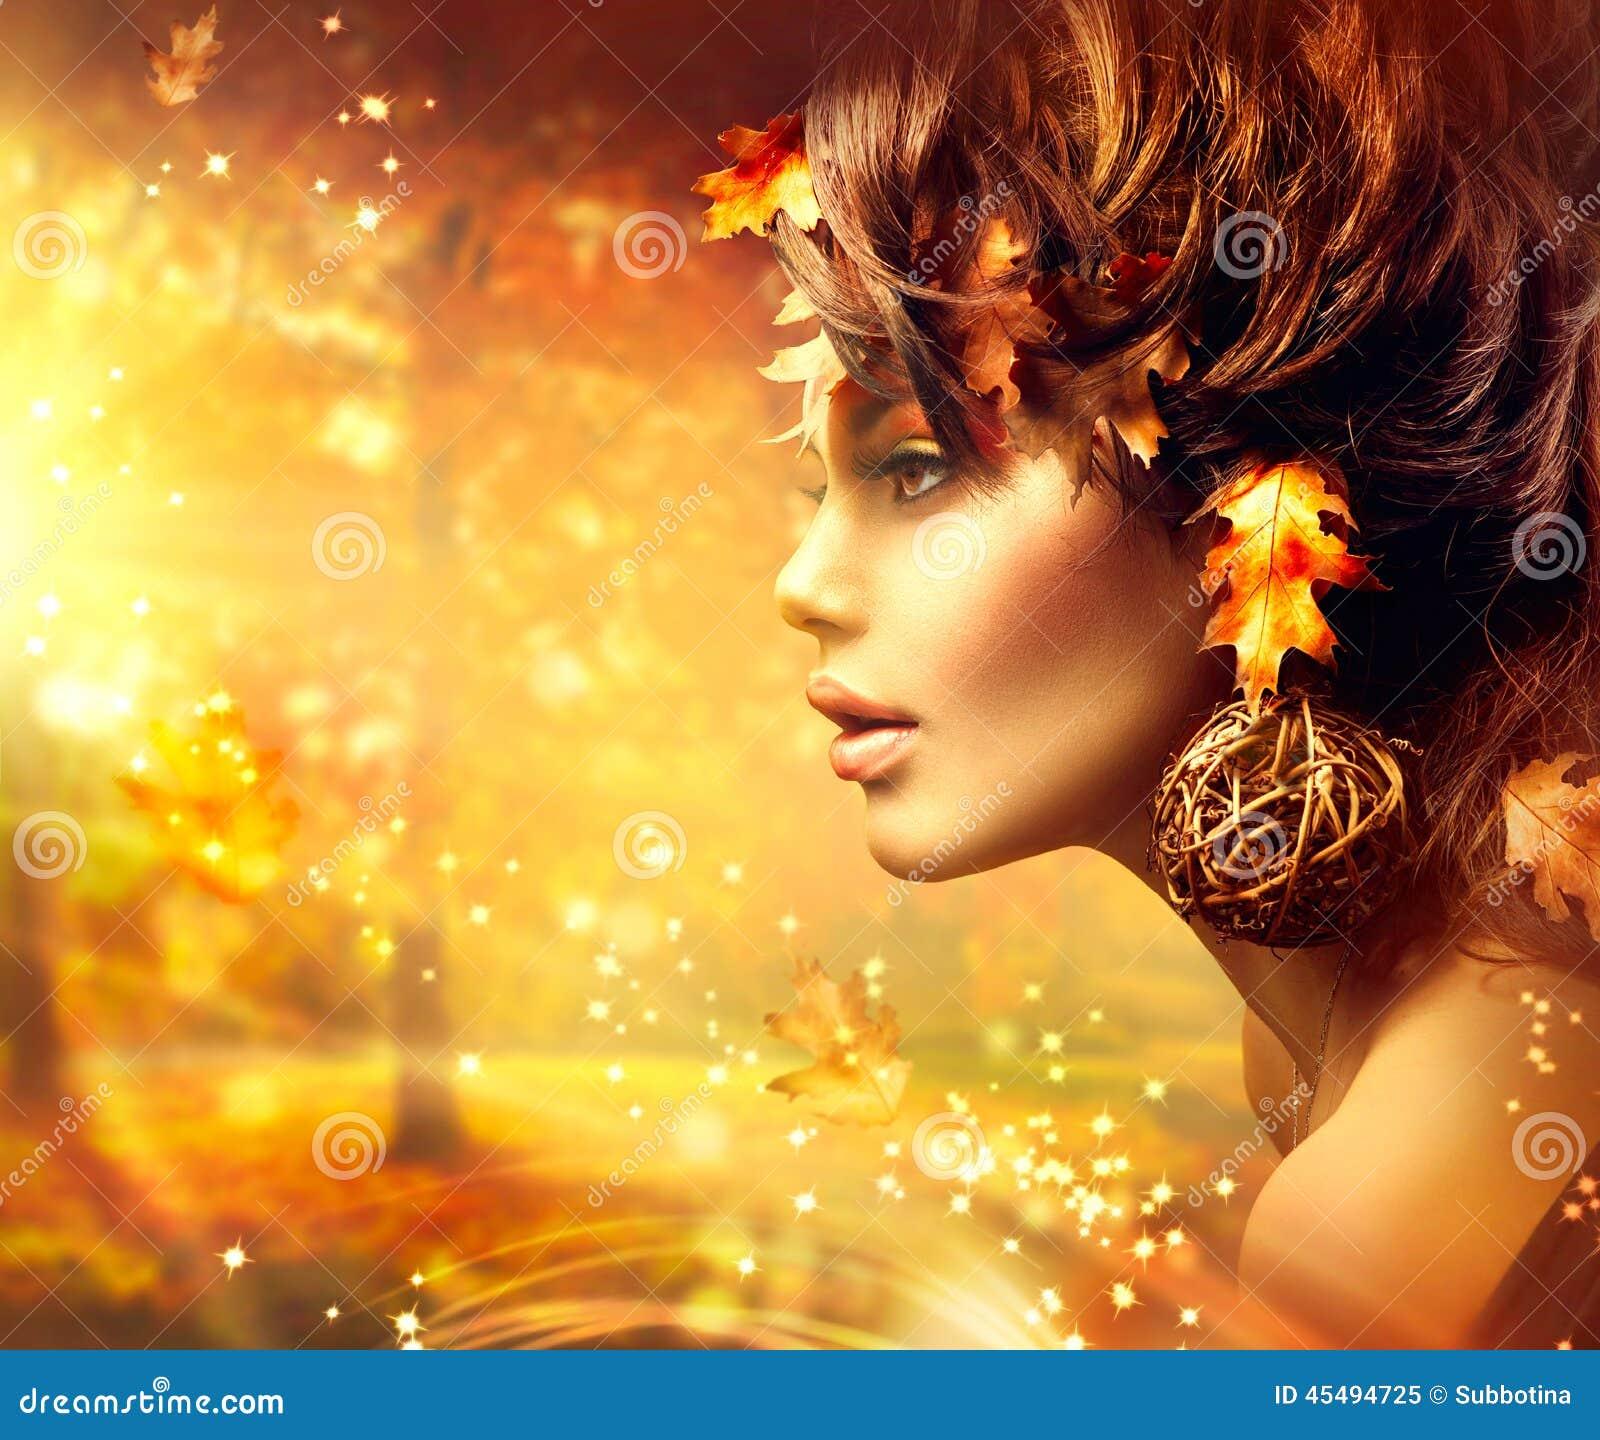 Autumn Woman Fantasy Fashion Portrait